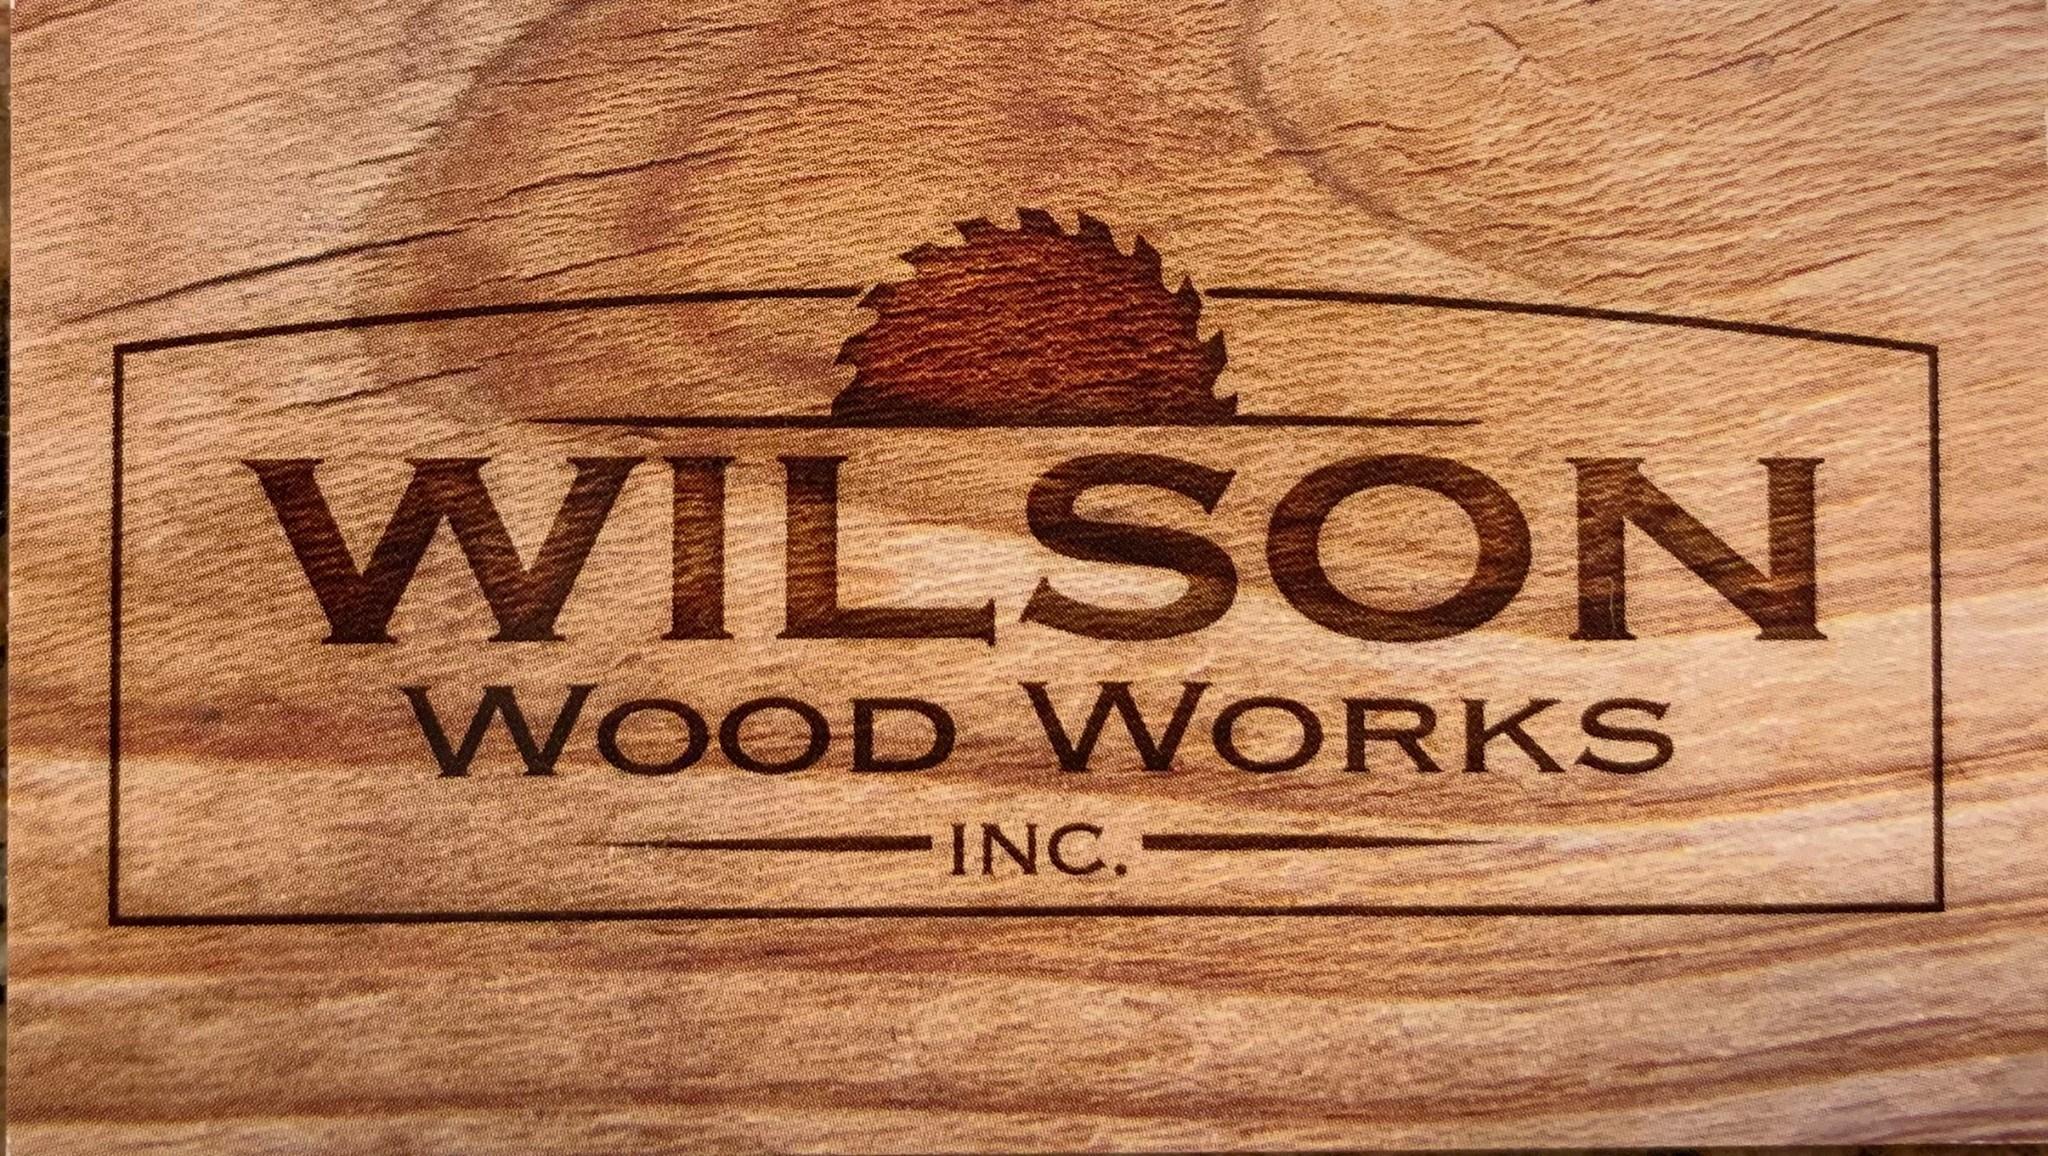 Wilson Wood Works, Inc Logo